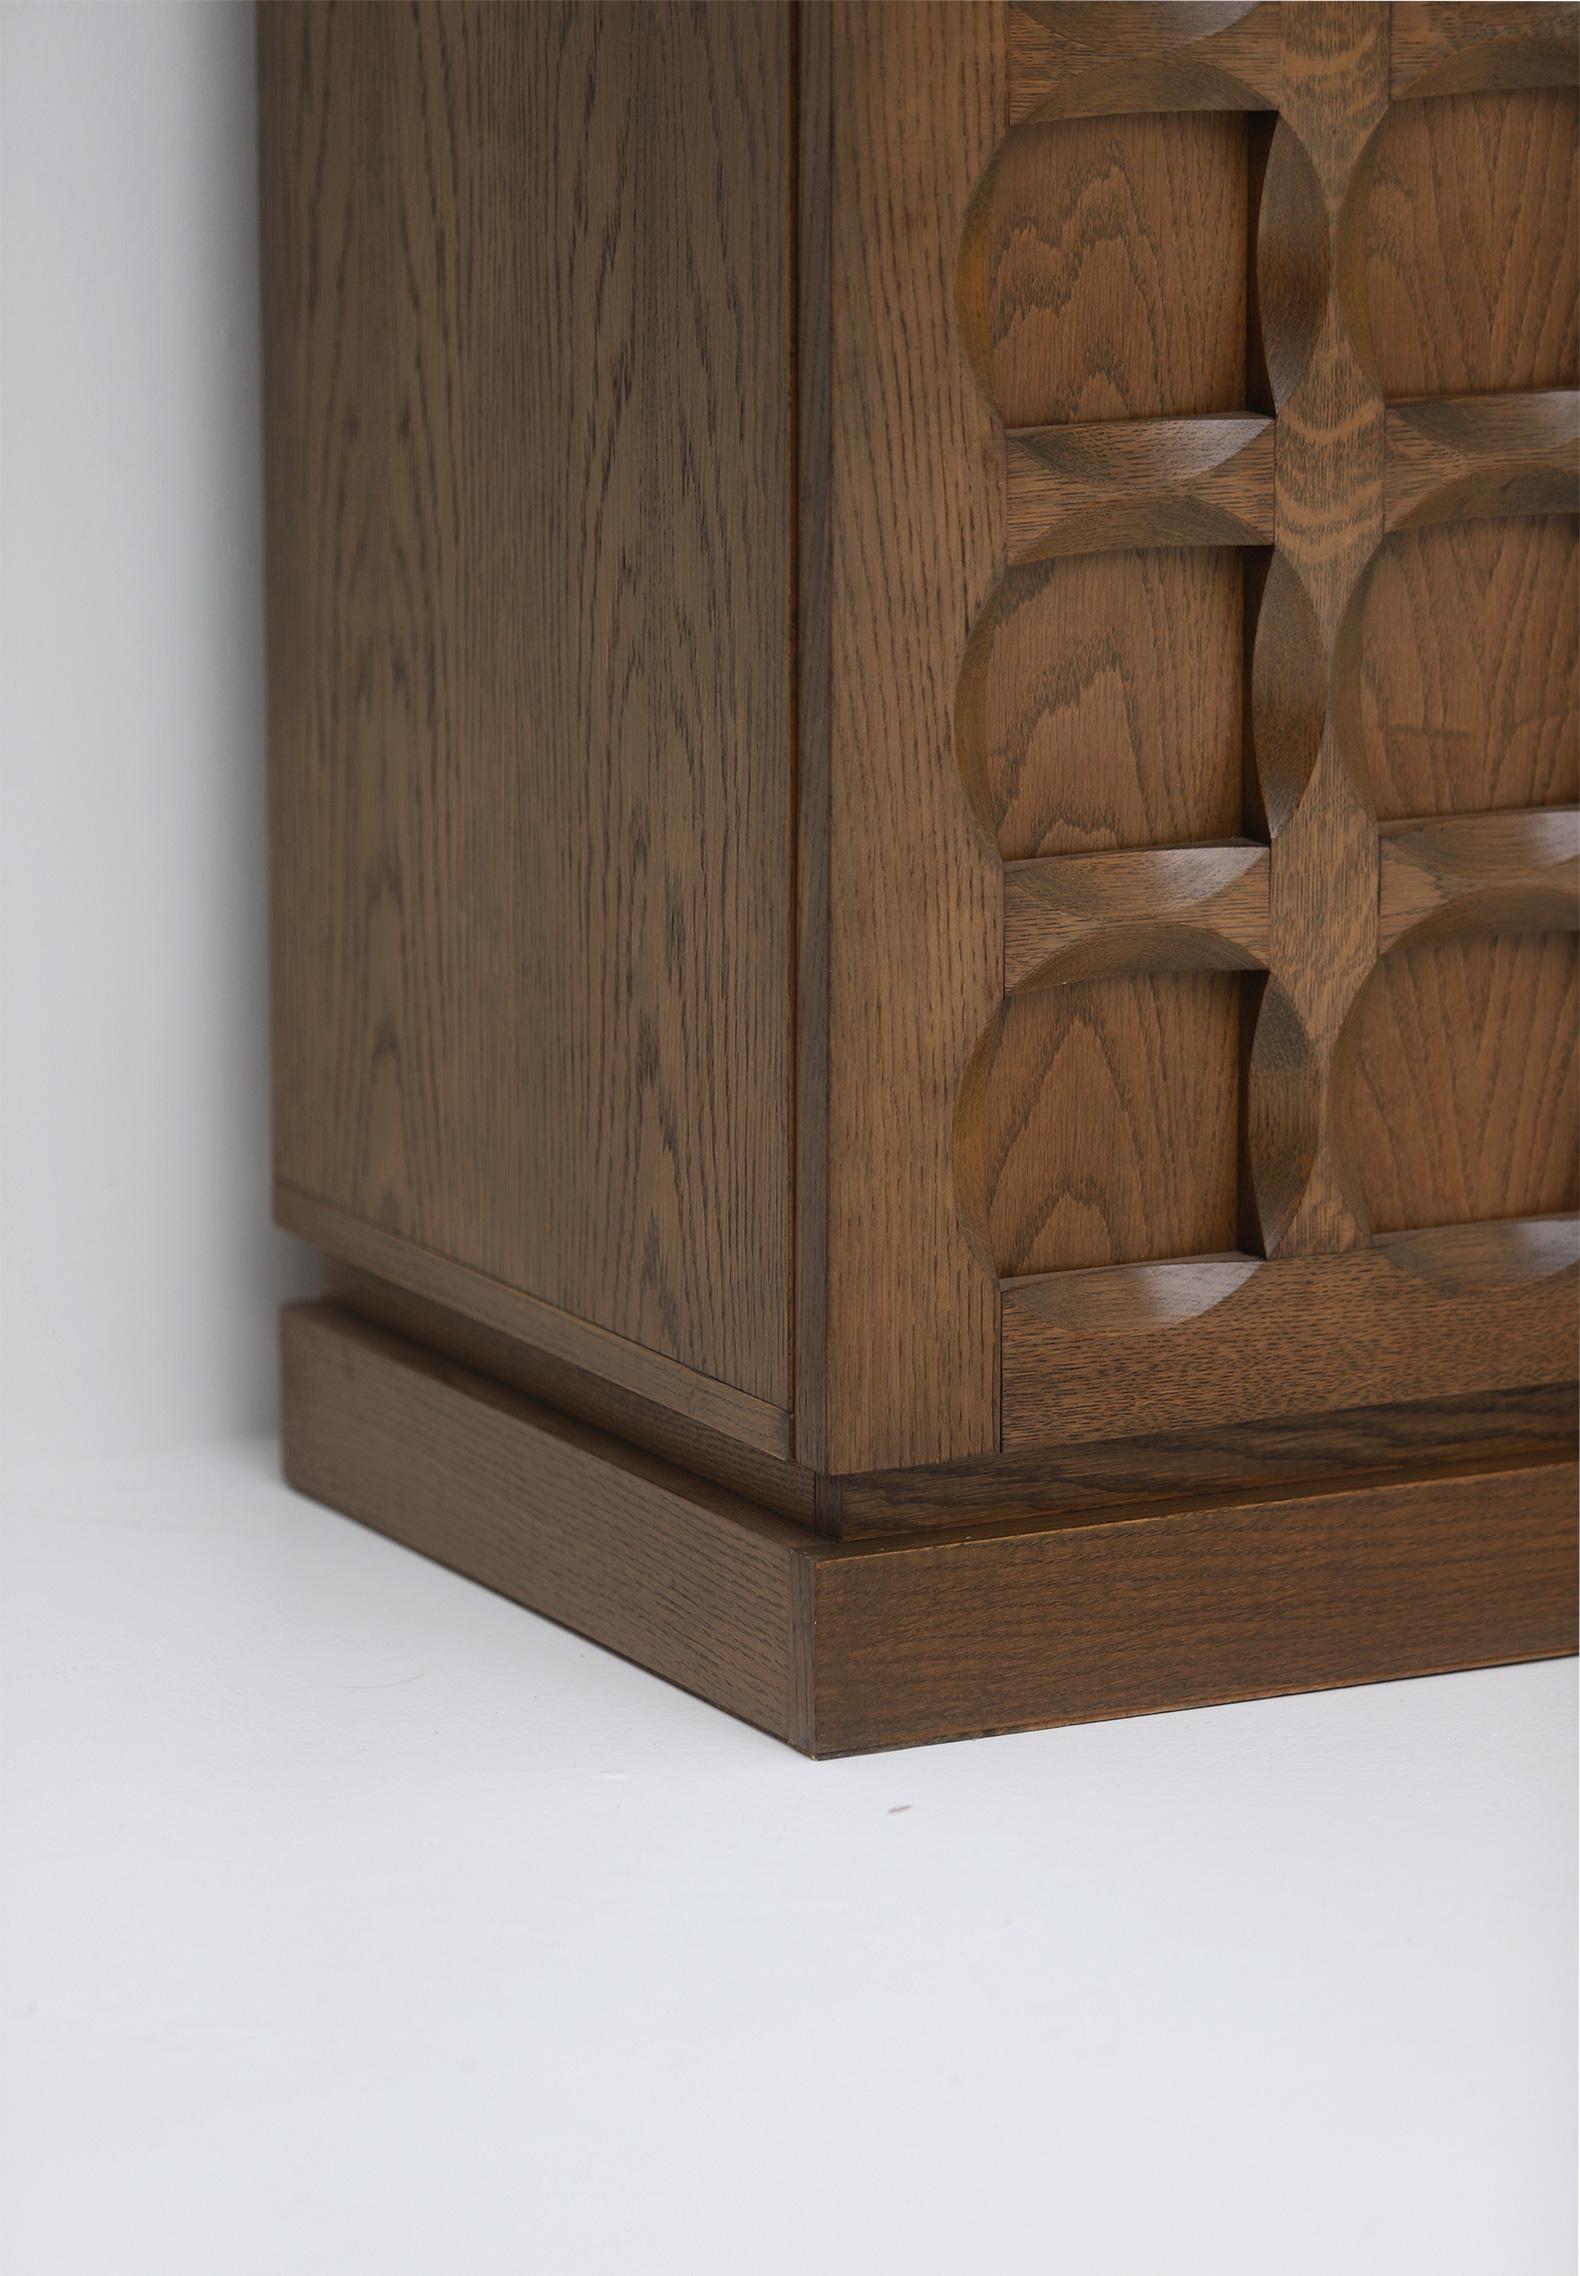 1970s Defour Cabinet Graphical Door Panels image 10